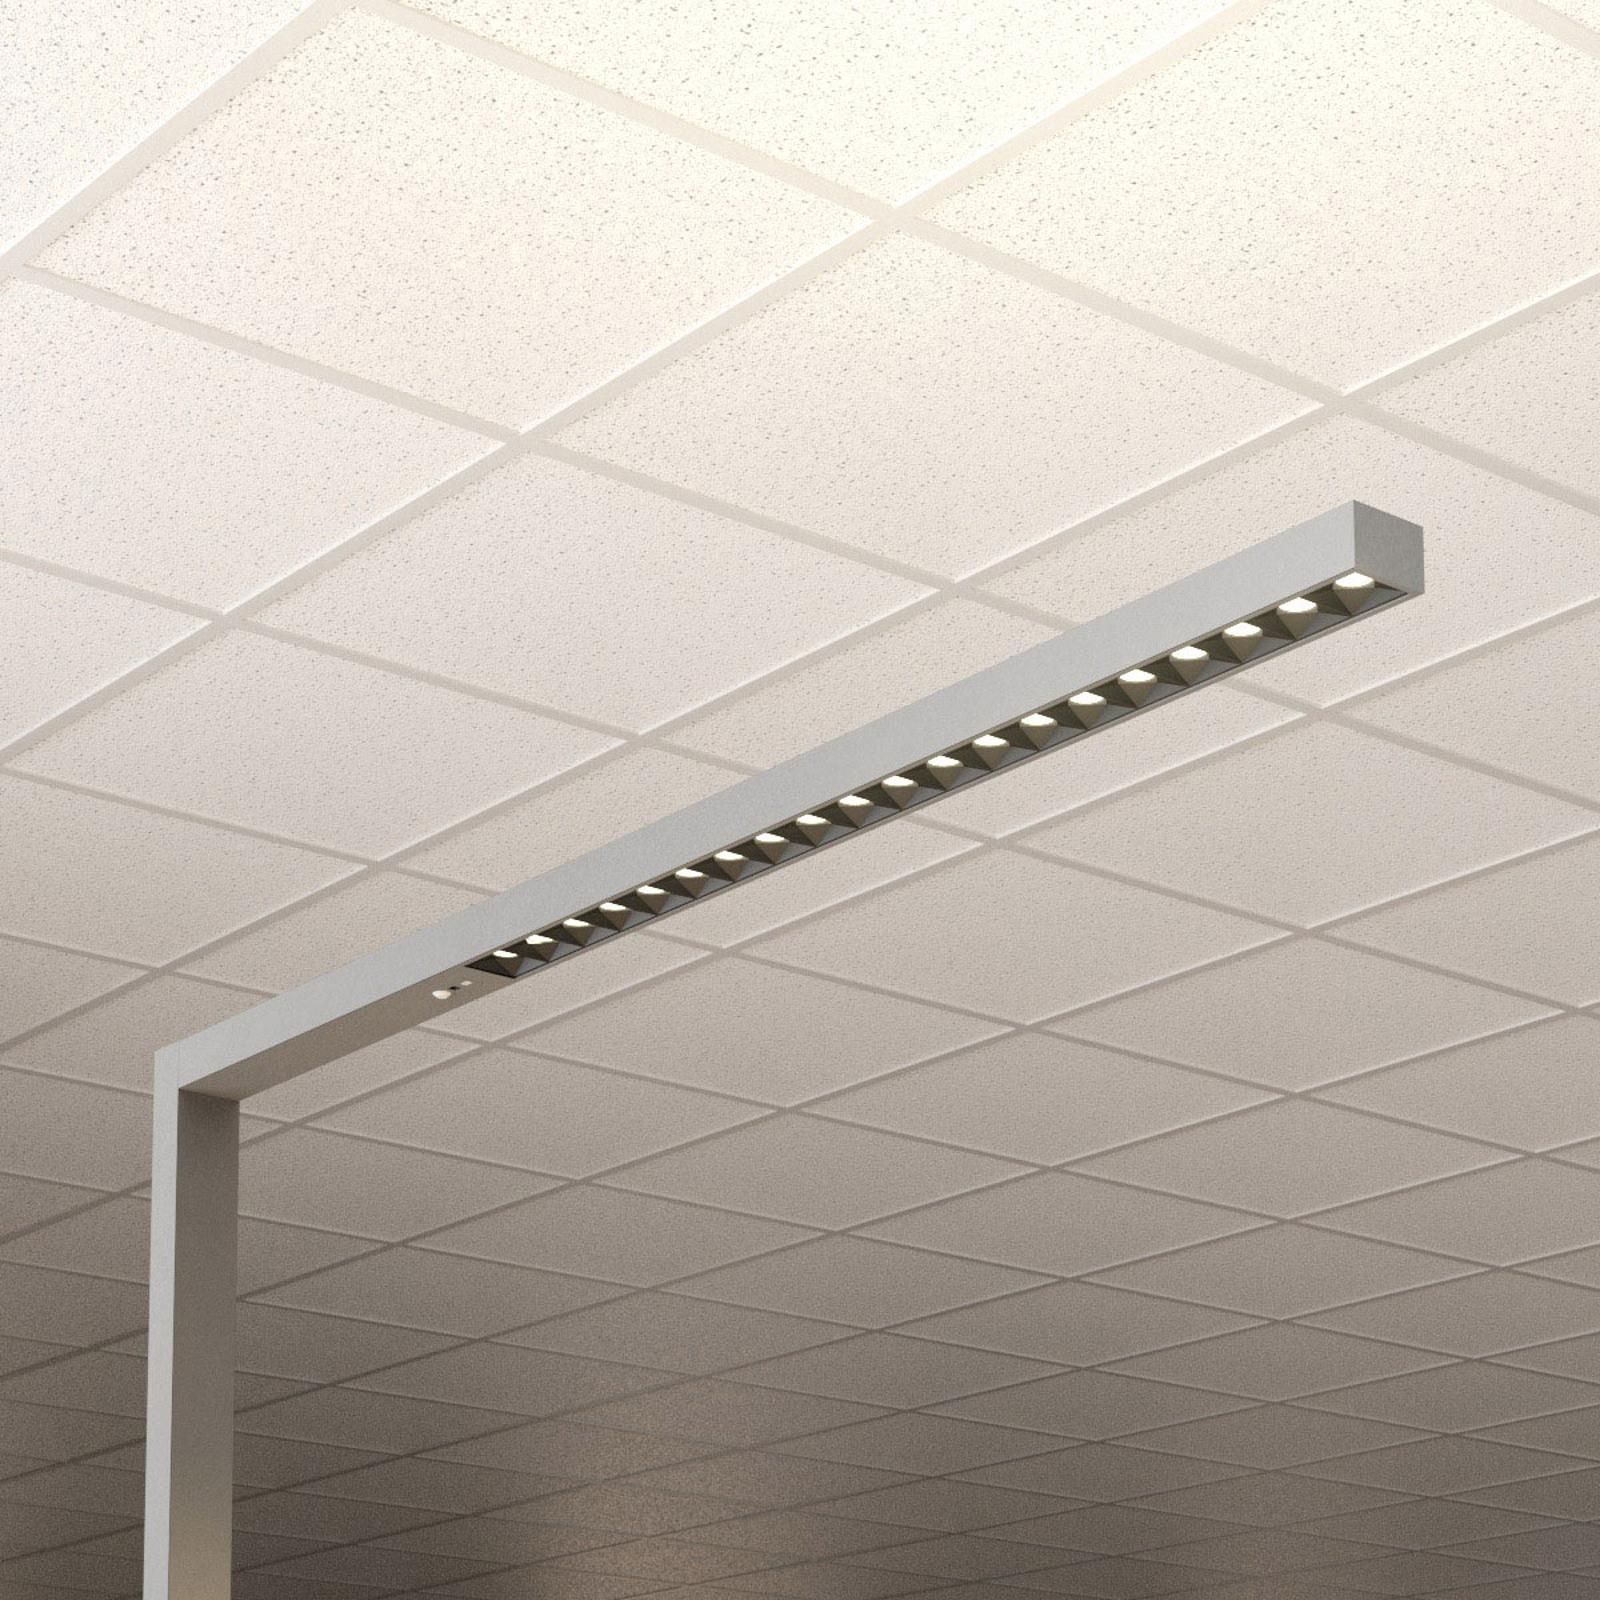 LED-gulvlampe kontor Laris, sølv, 3000 - 6000 K